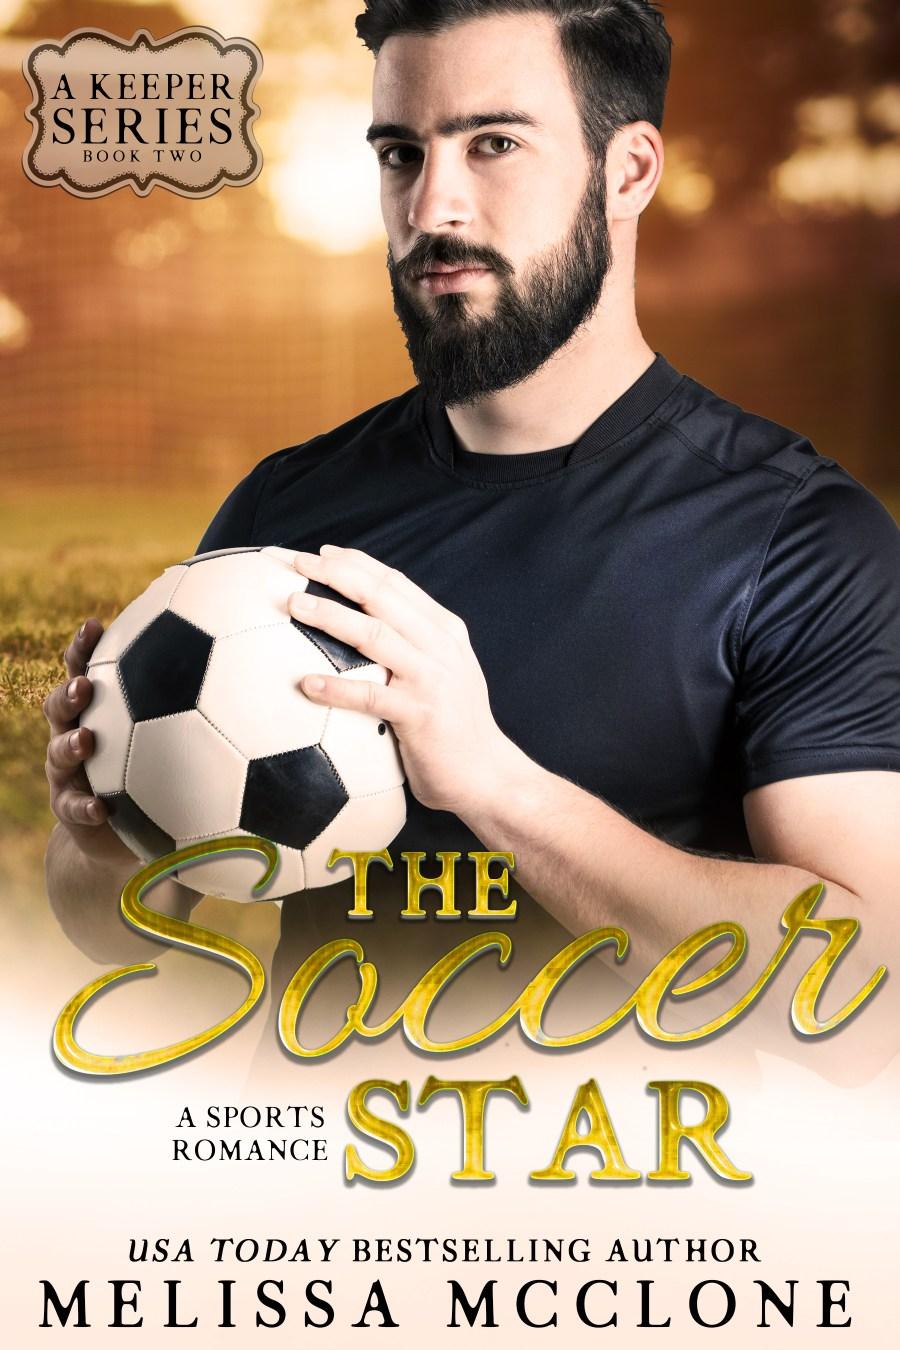 The Soccer Star: A Sports Romance (A Keeper Series, #2)